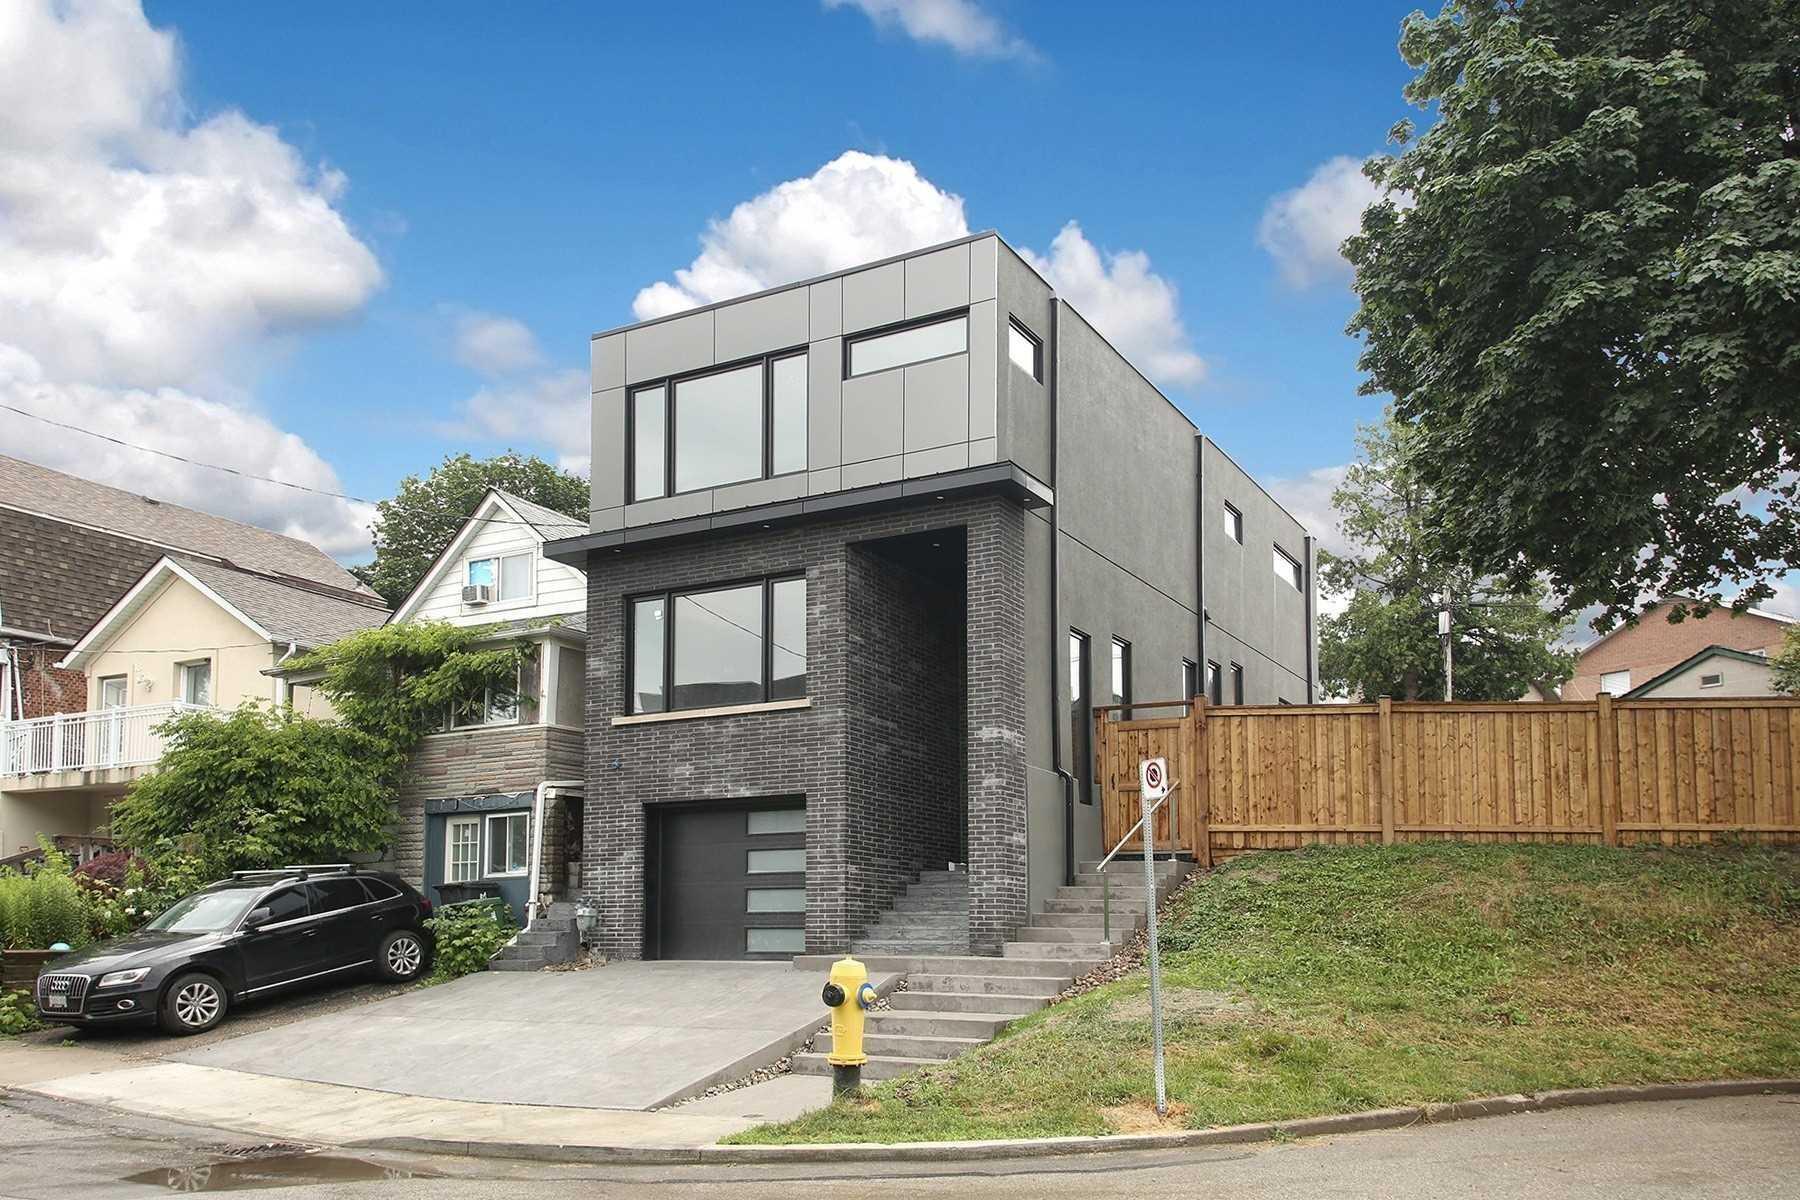 22 Woodcroft Cres, Toronto, Ontario M6E1W8, 3 Bedrooms Bedrooms, 6 Rooms Rooms,4 BathroomsBathrooms,Detached,For Sale,Woodcroft,W5337942